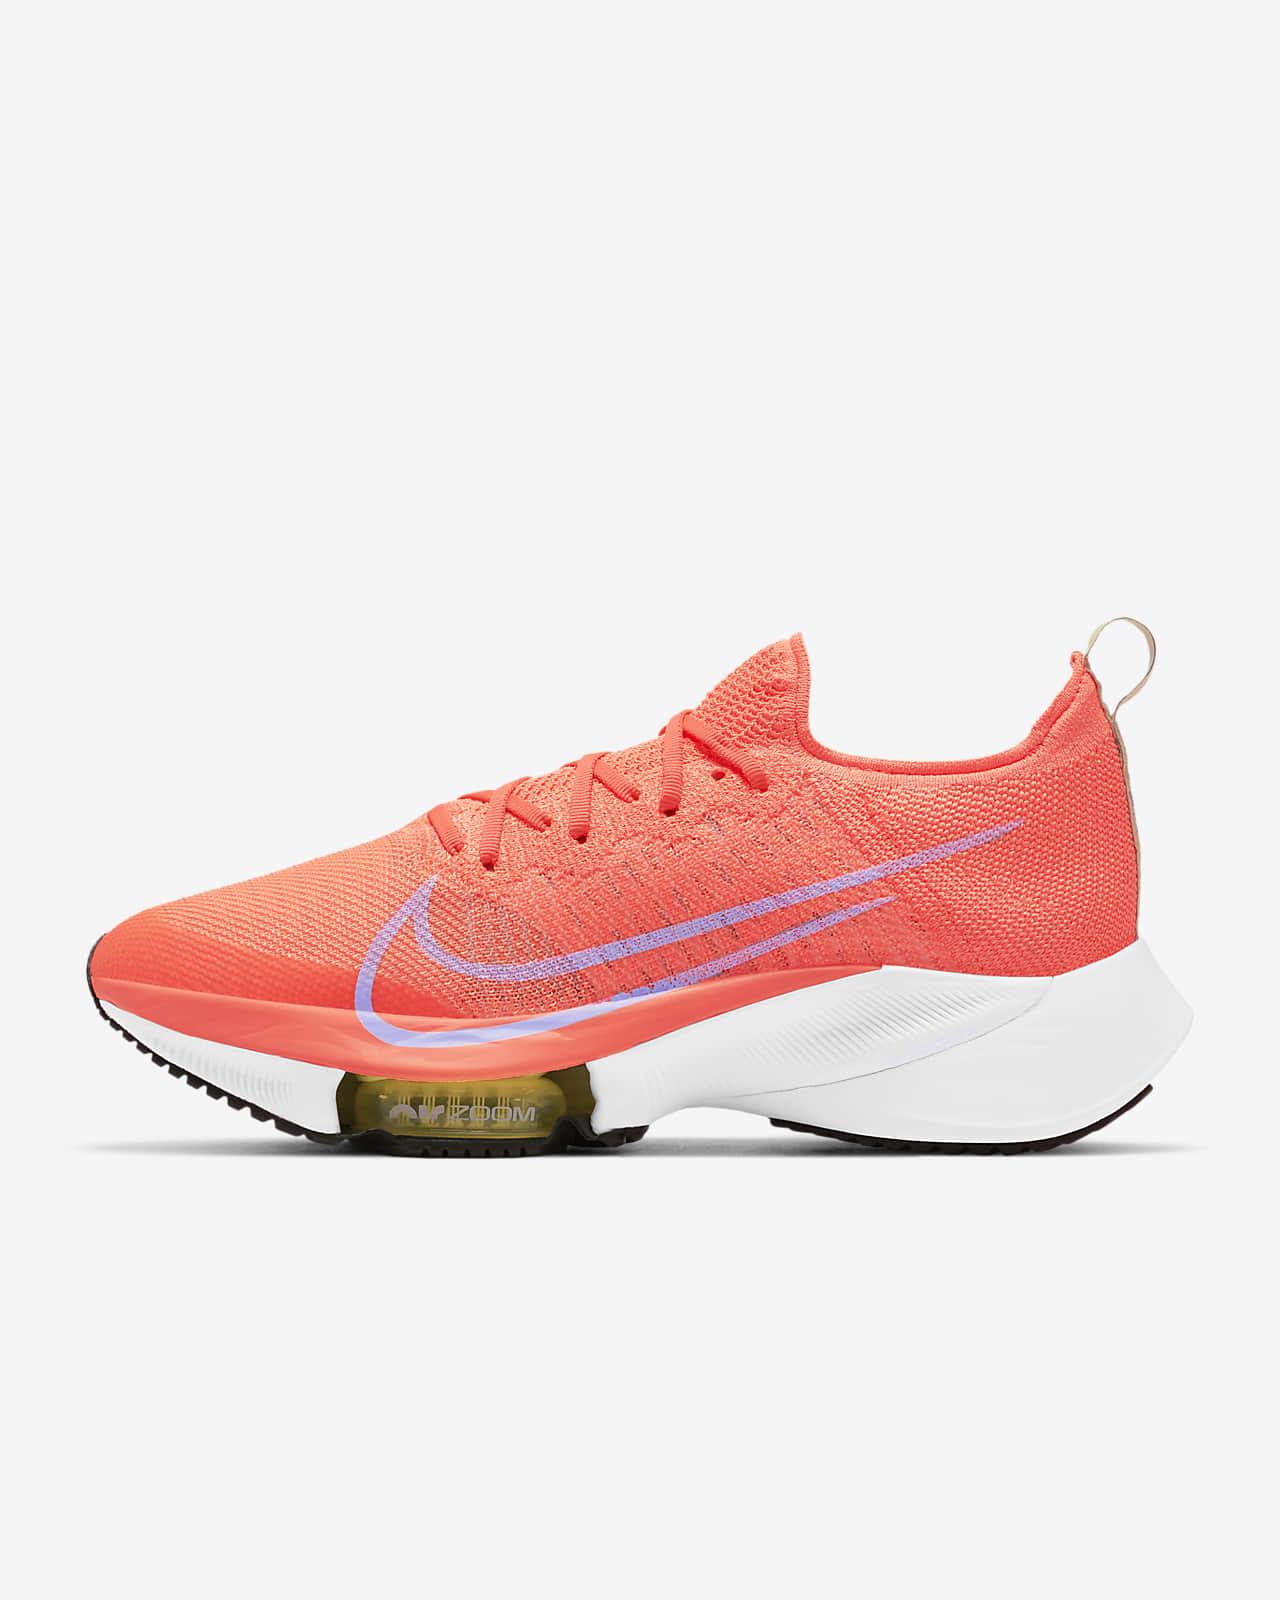 Chaussure de running Nike Air Zoom Tempo NEXT% pour Femme